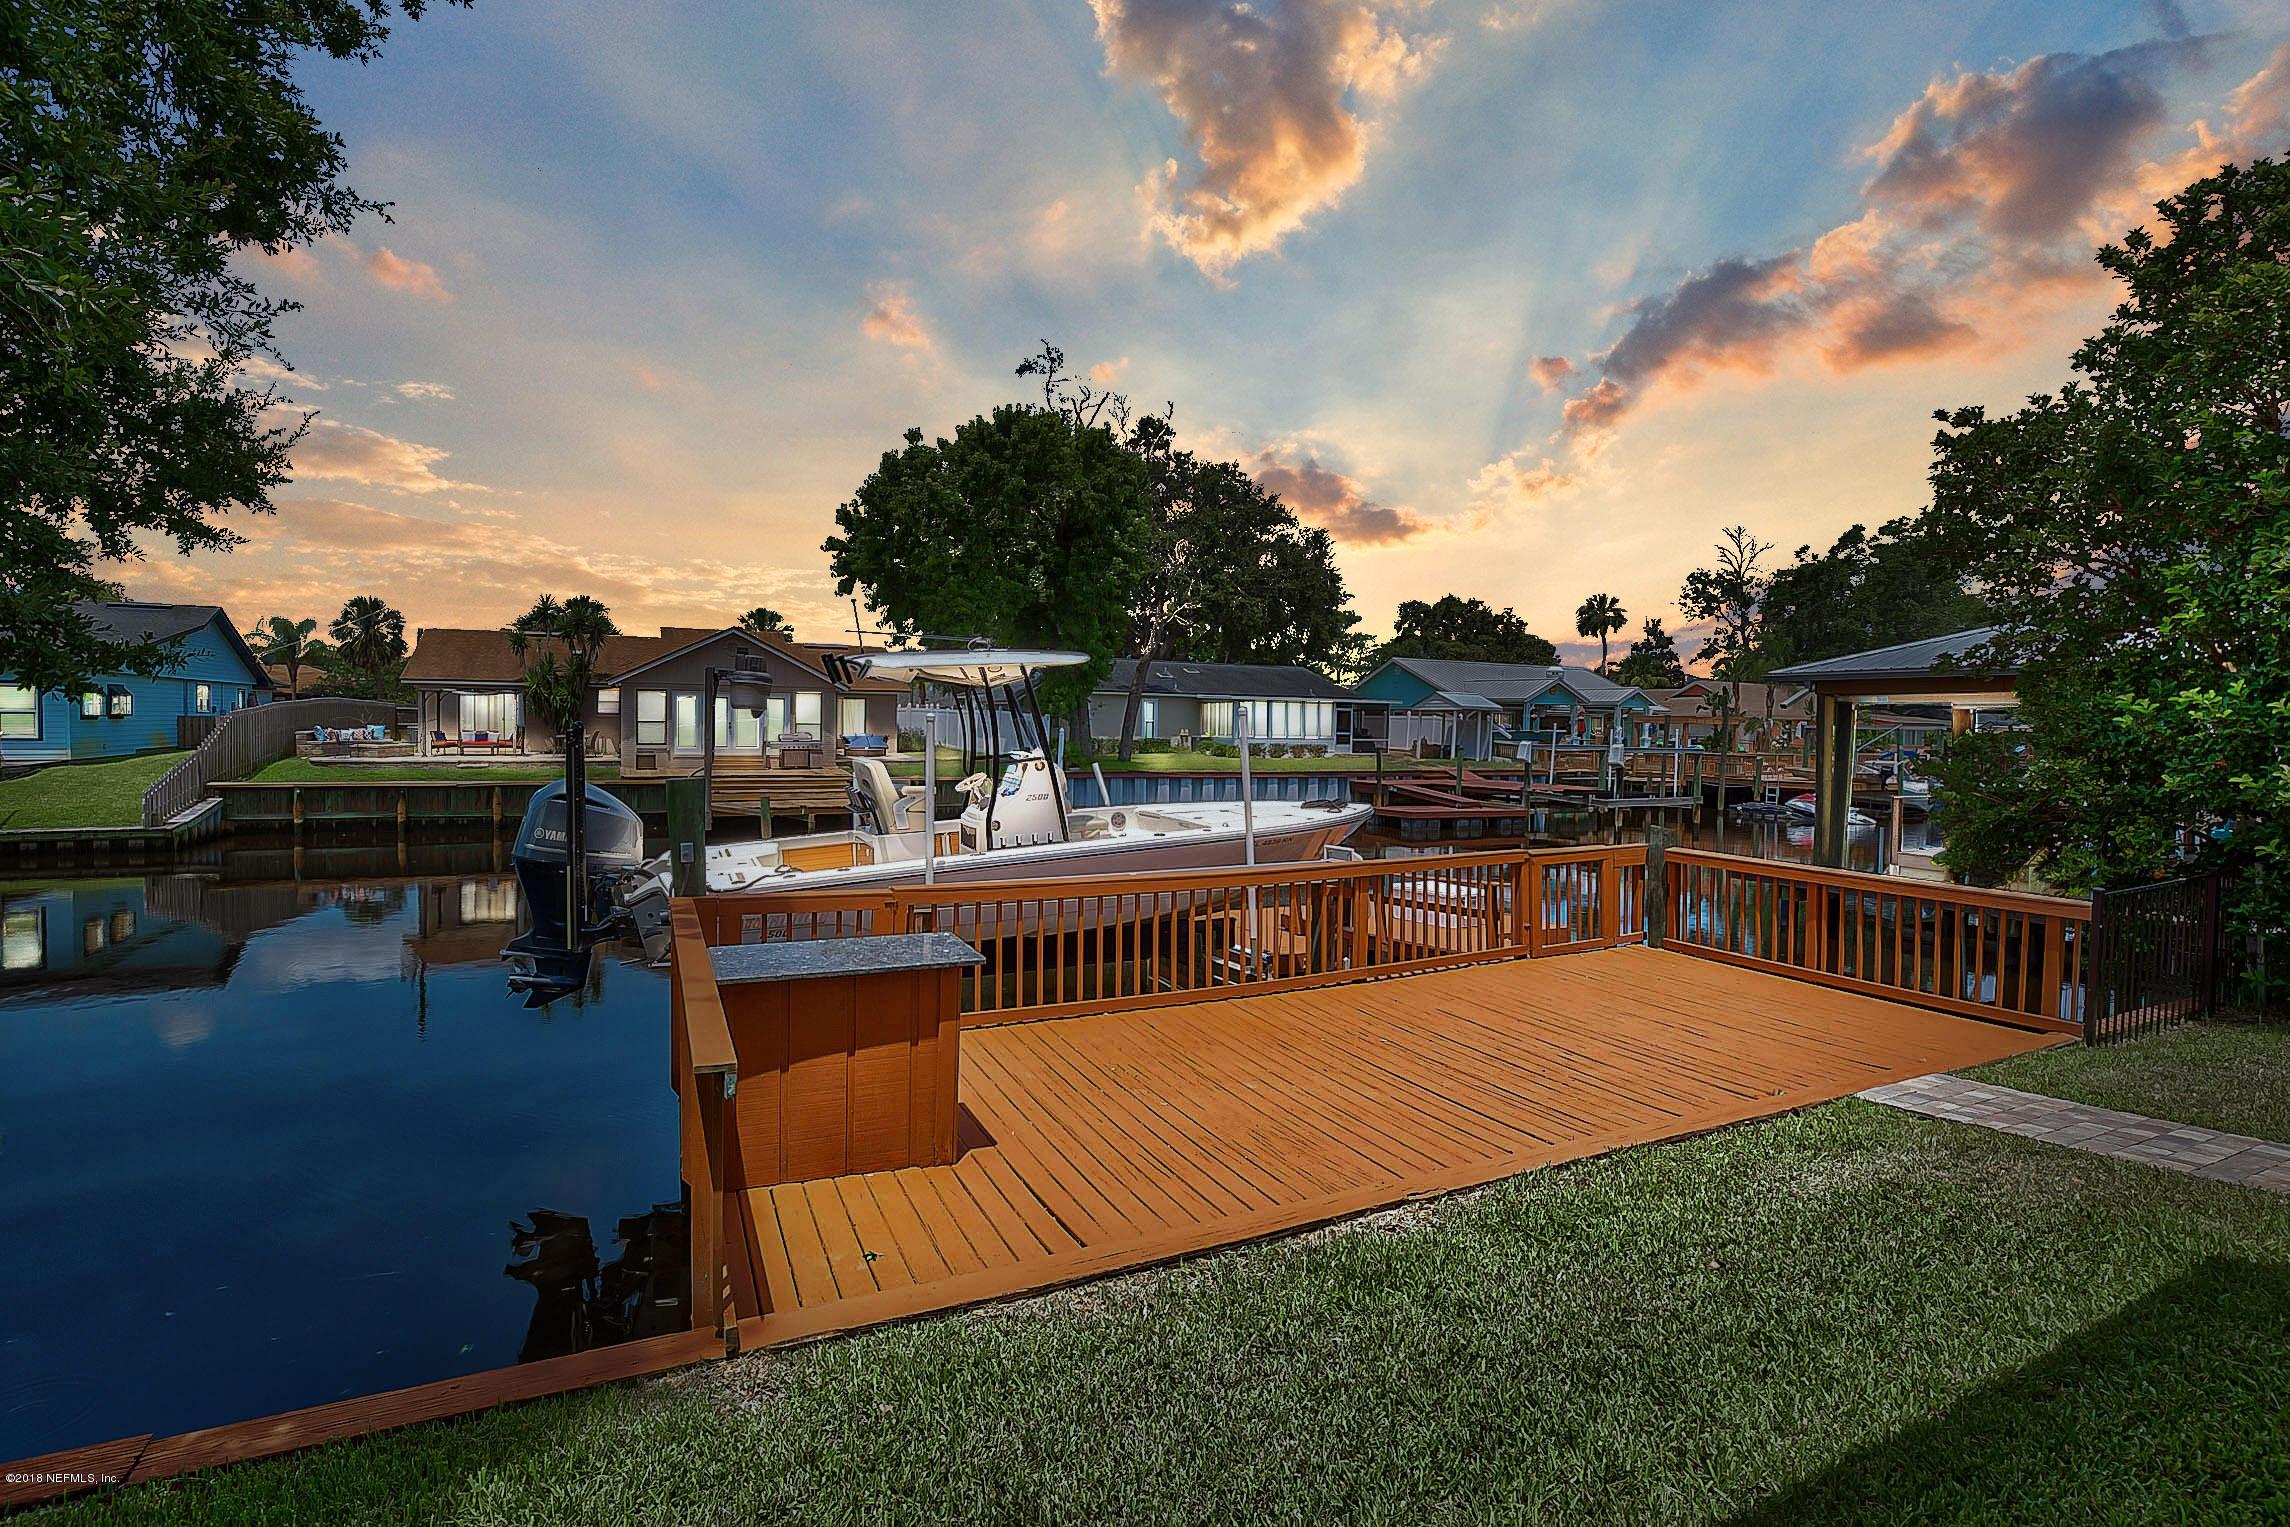 4346 TRADEWINDS, JACKSONVILLE, FLORIDA 32250, 4 Bedrooms Bedrooms, ,3 BathroomsBathrooms,Residential - single family,For sale,TRADEWINDS,948109